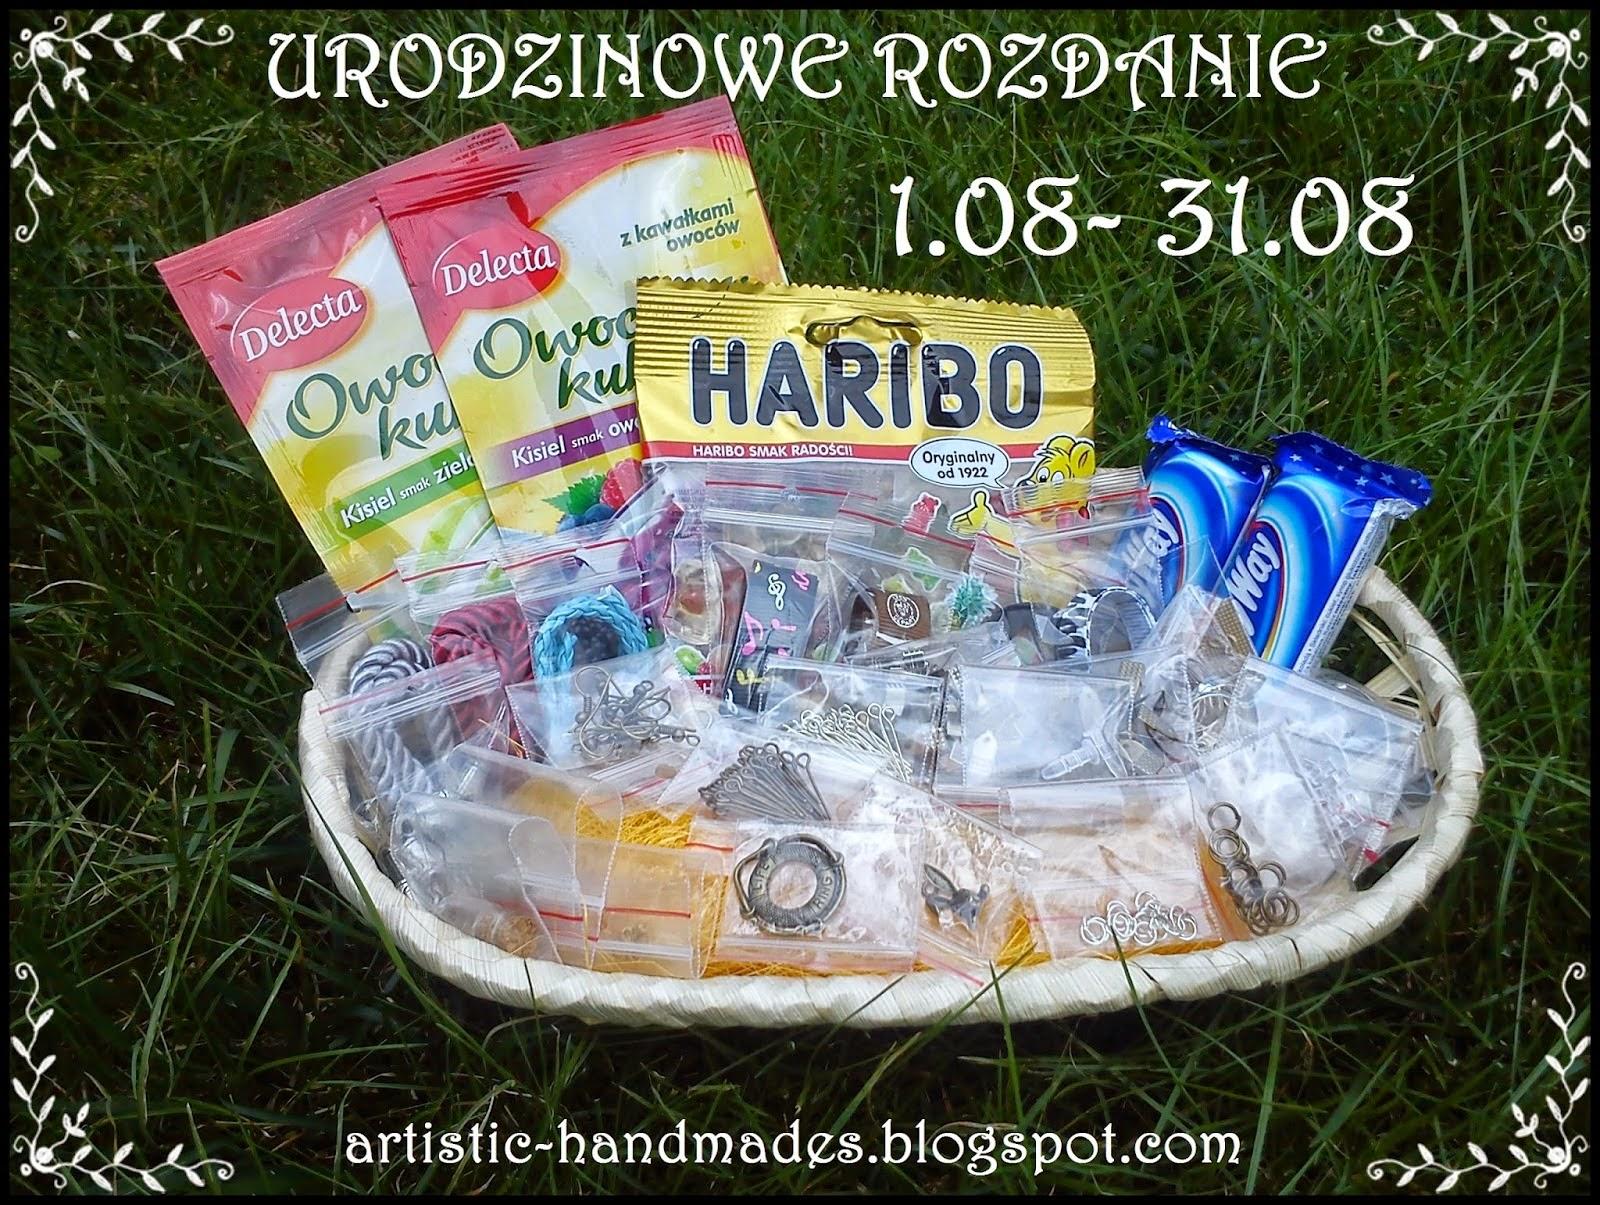 http://artistic-handmades.blogspot.com/2014/08/urodzinowe-rozdanie.html